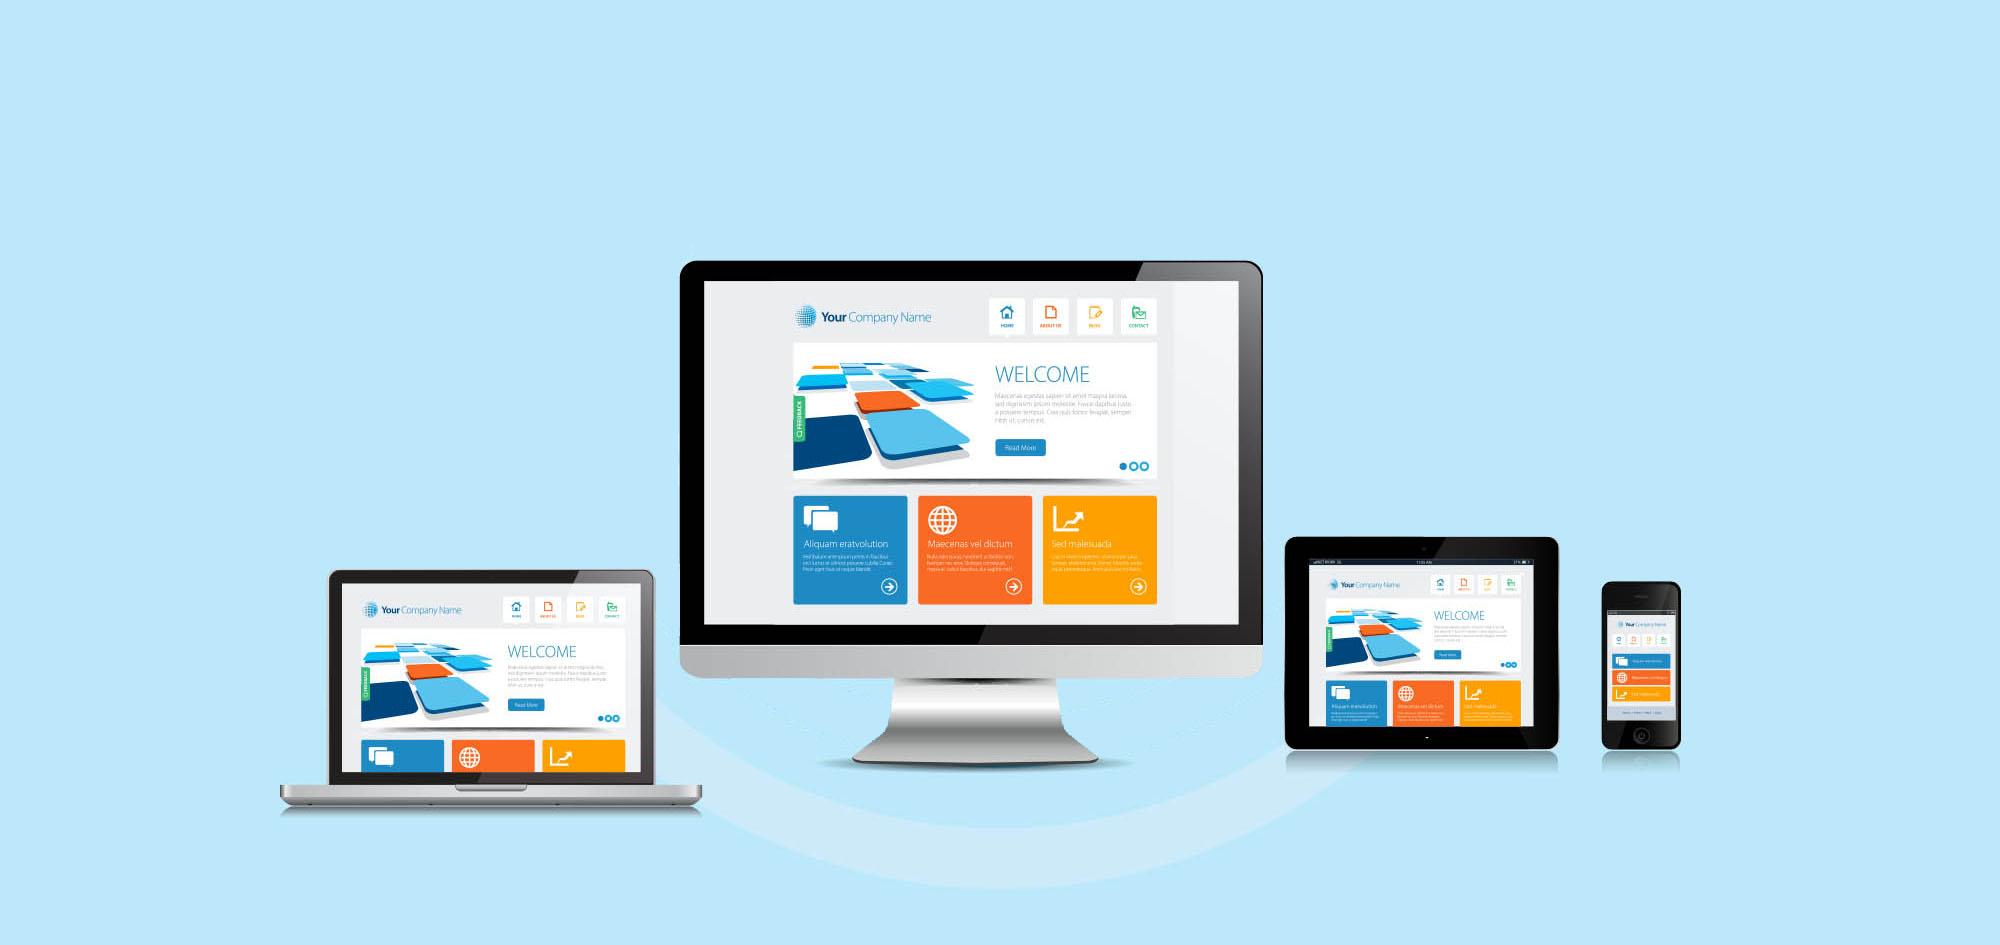 wewa-web-design-slider